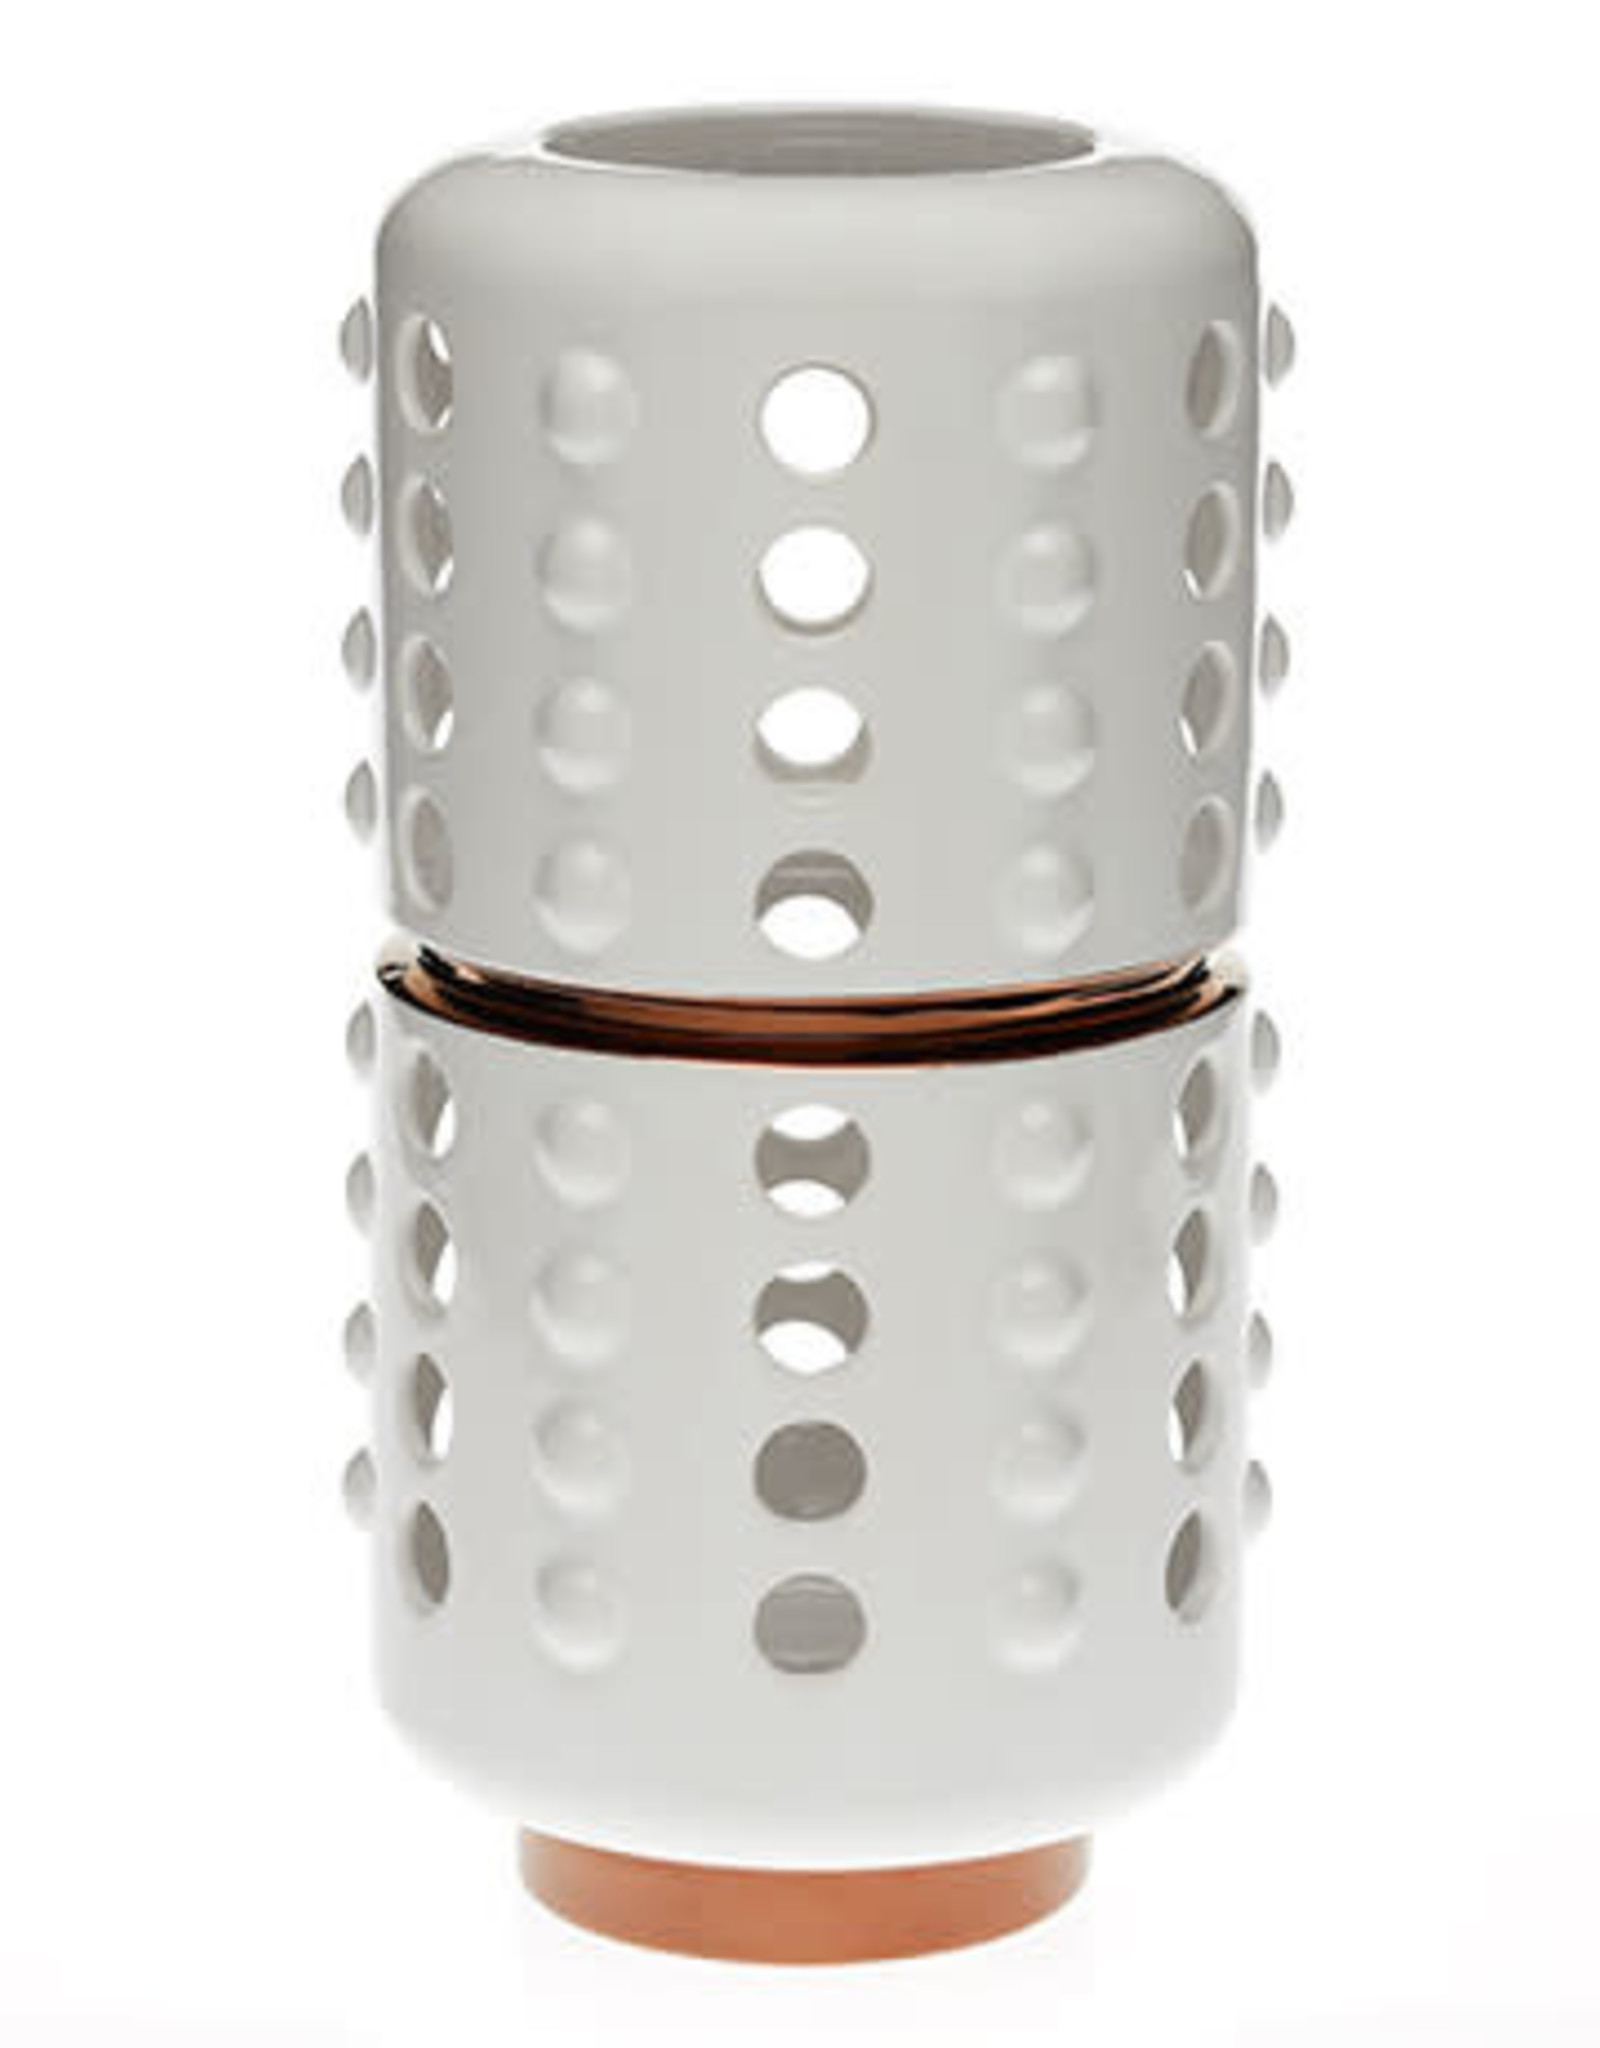 Byfly Octo Table Lamp